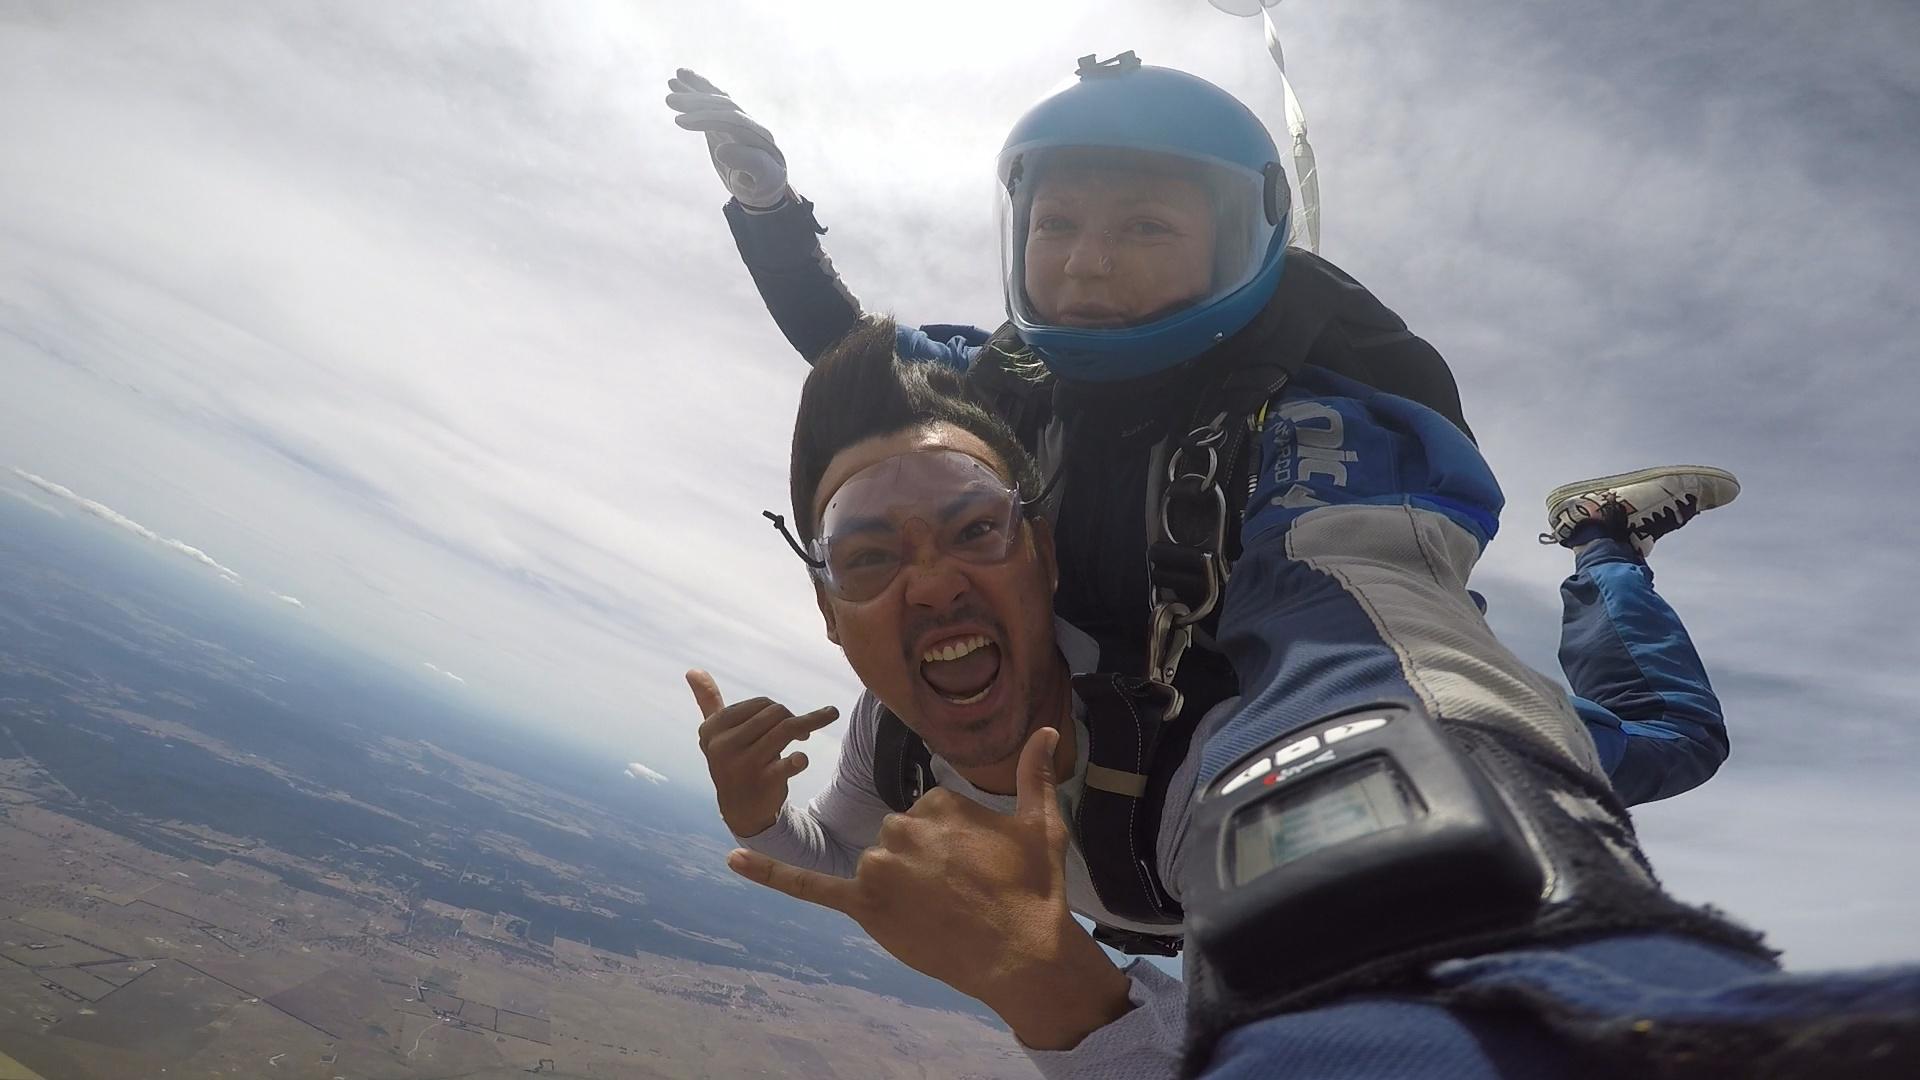 Adrenalin Skydive Goulburn Canberra Sydney NSW